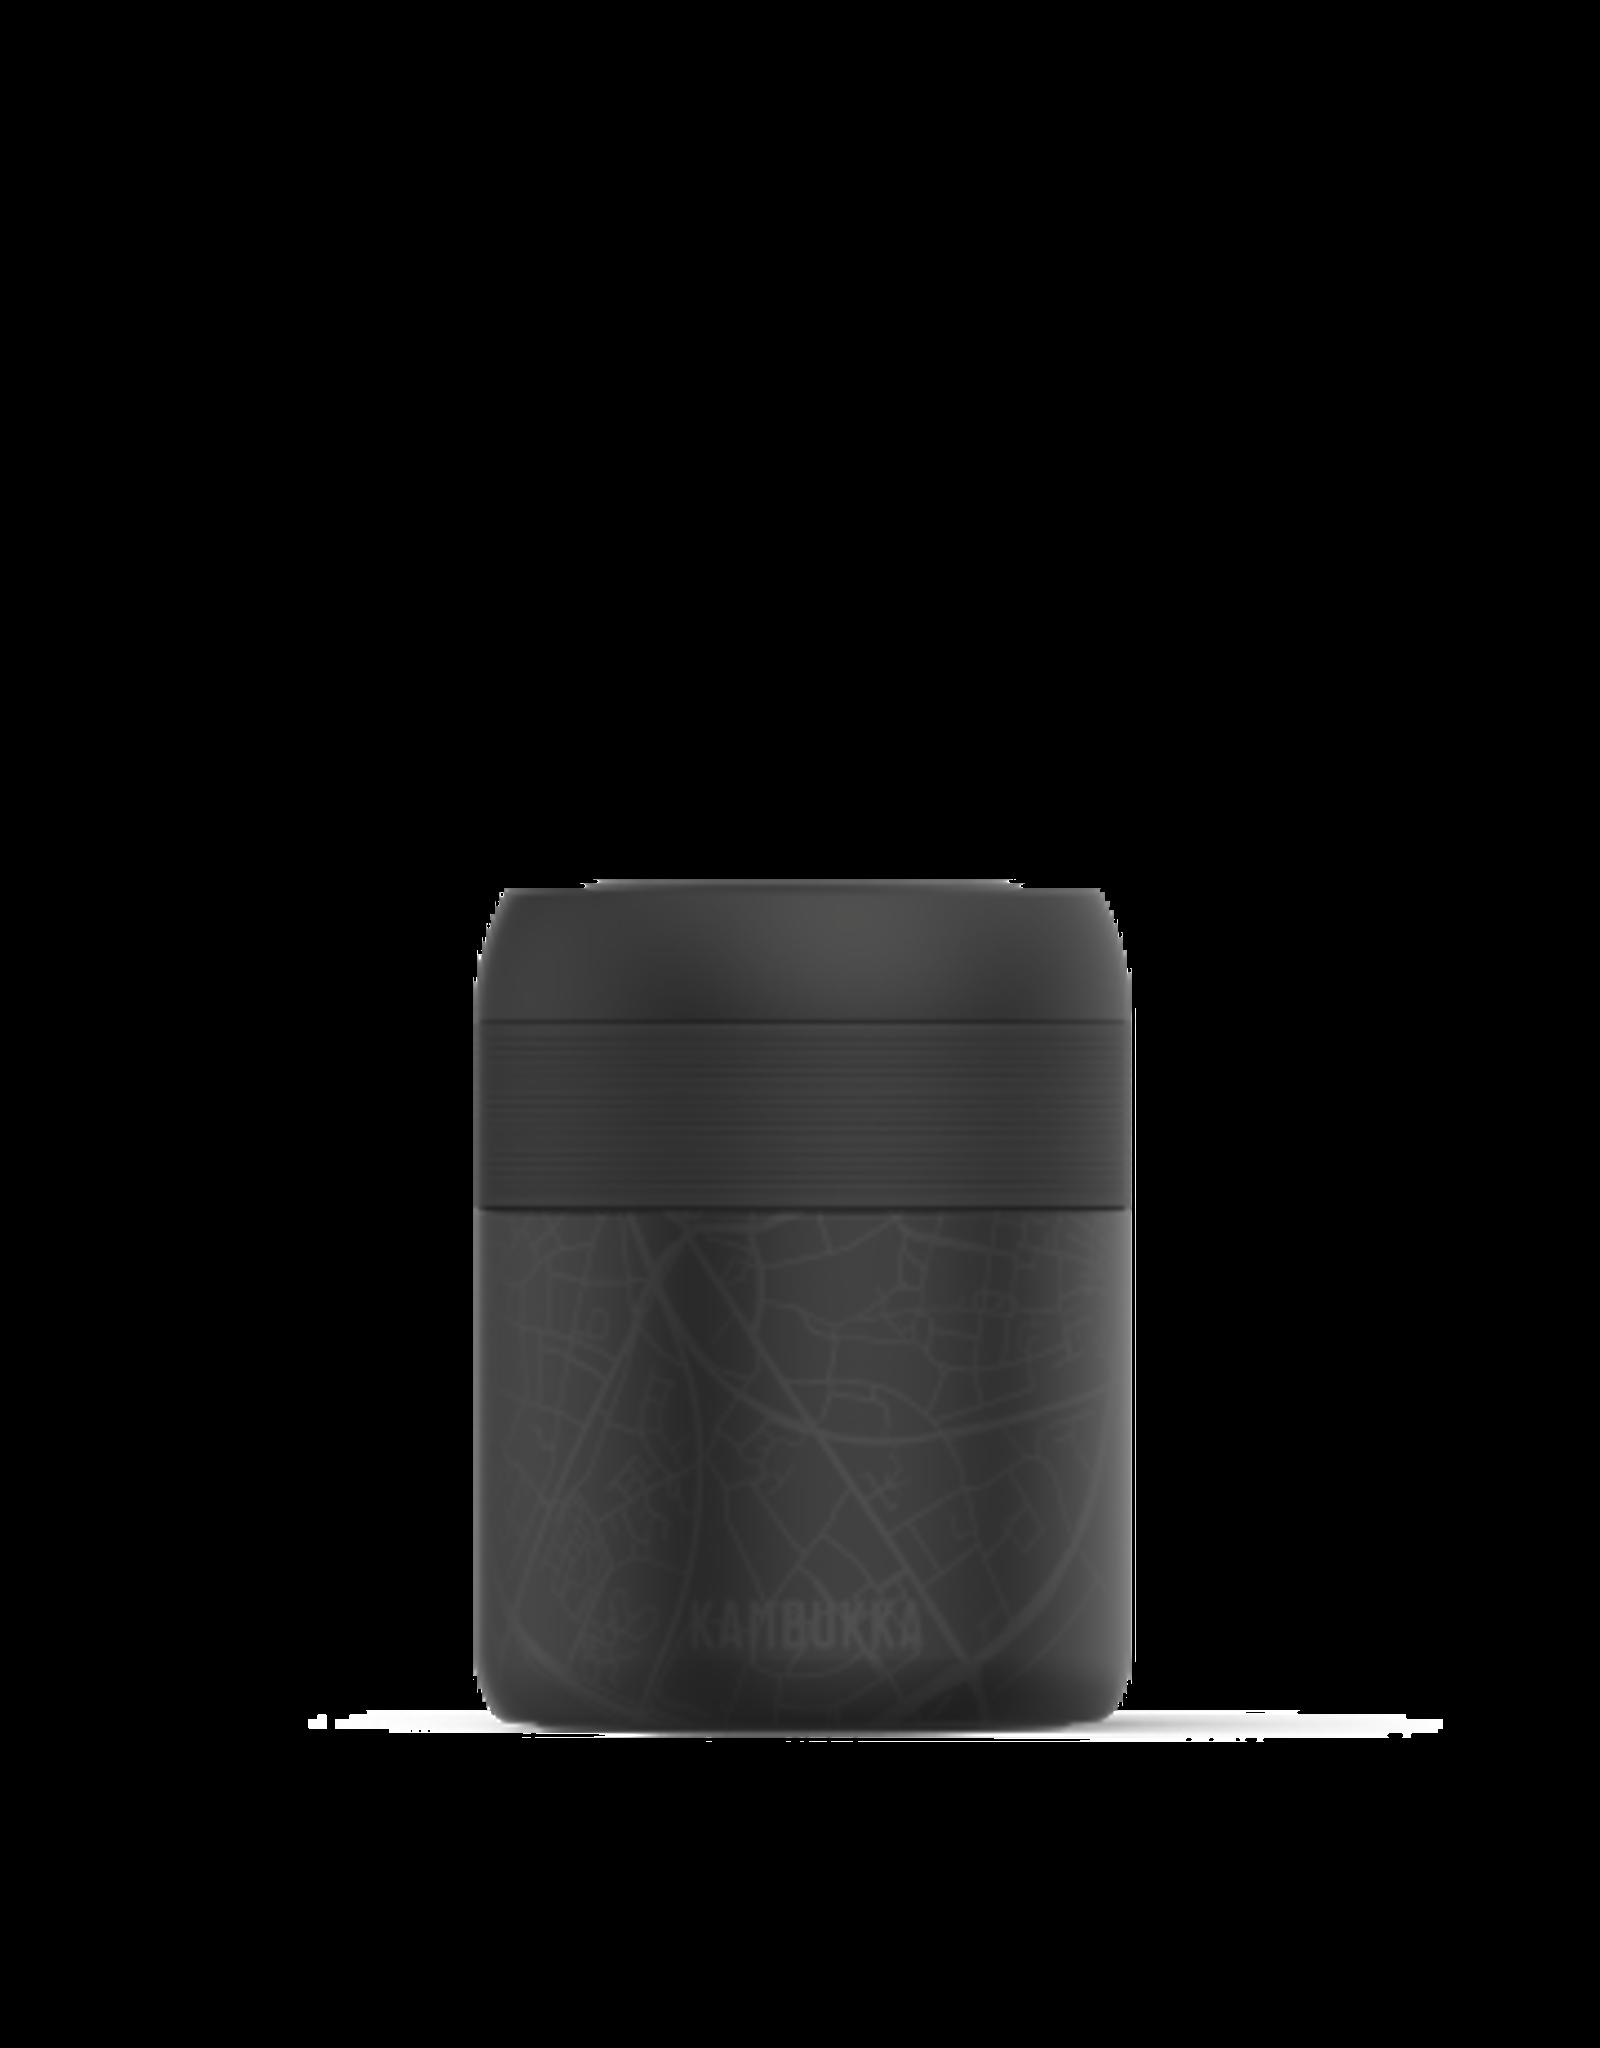 Kambukka Thermosbeker Bora 100% Hasselt - 600 ml